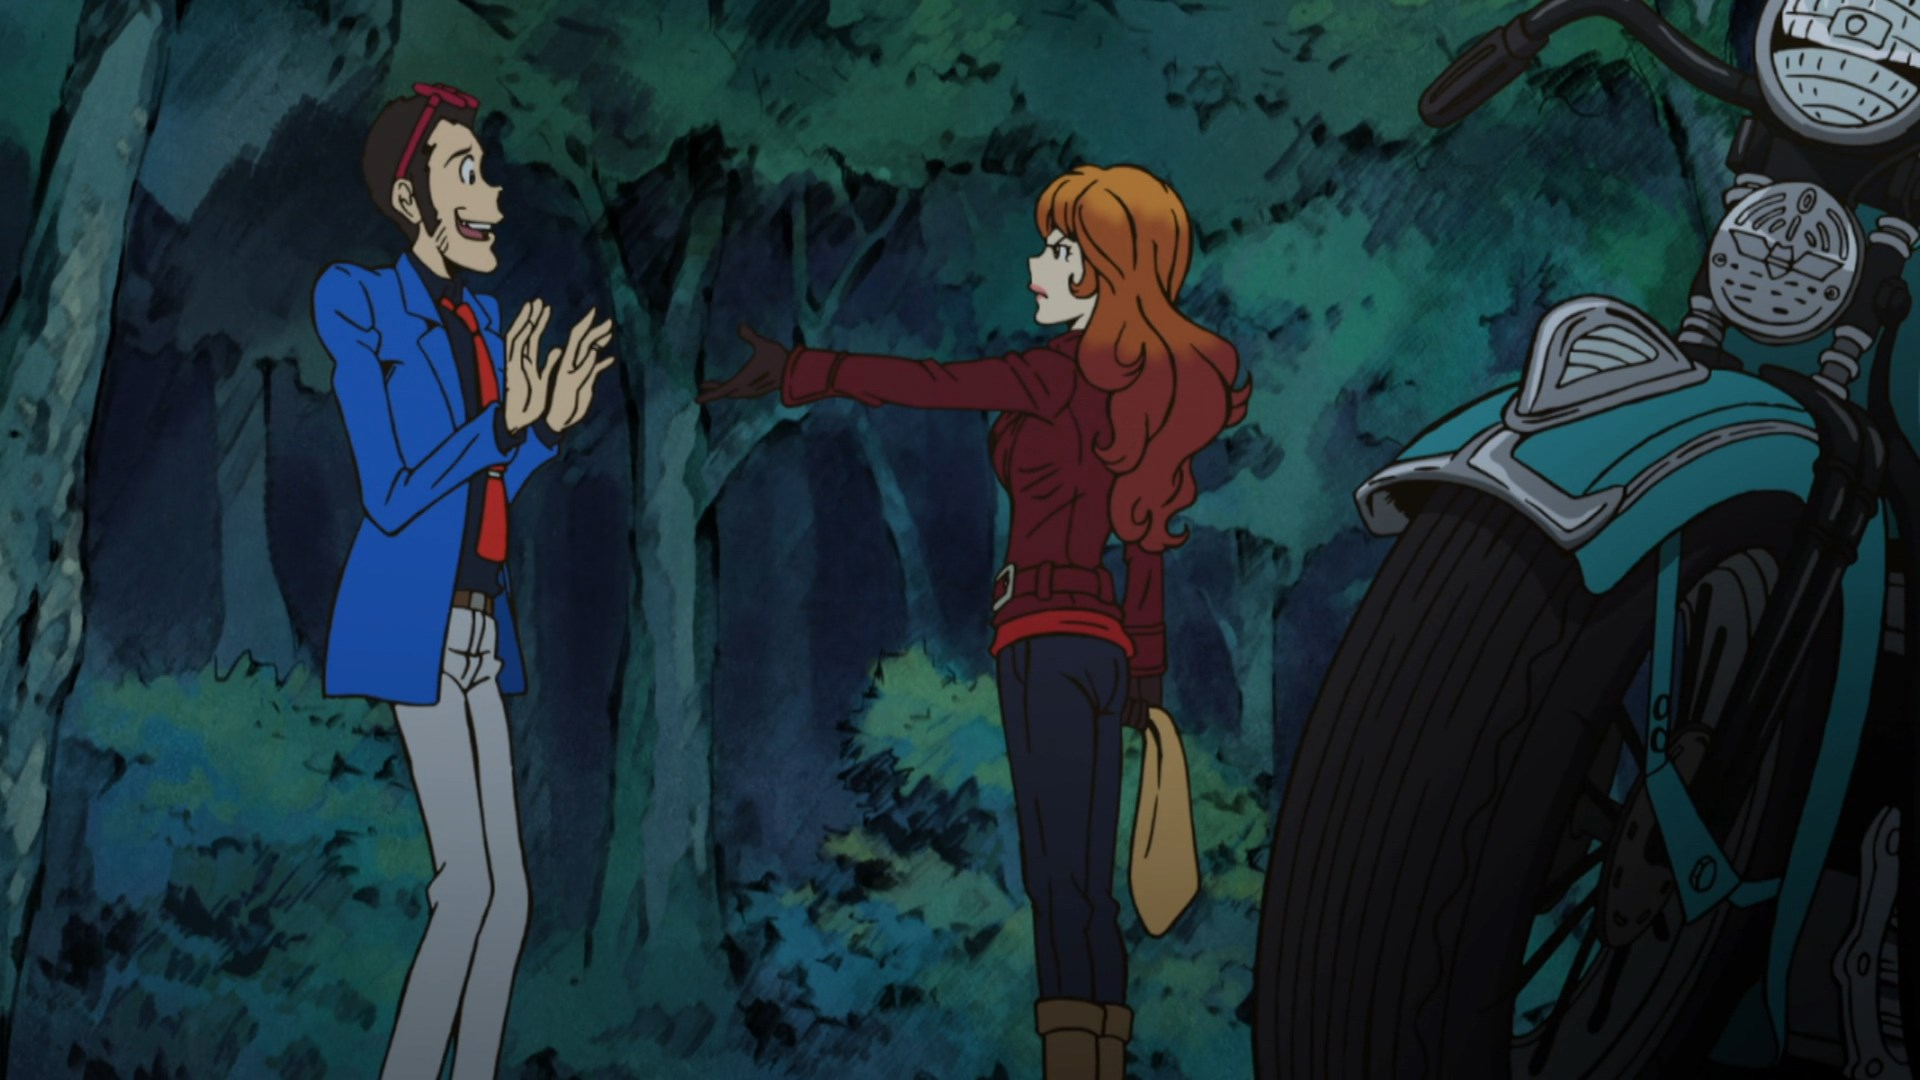 Lupin III Part 4-3